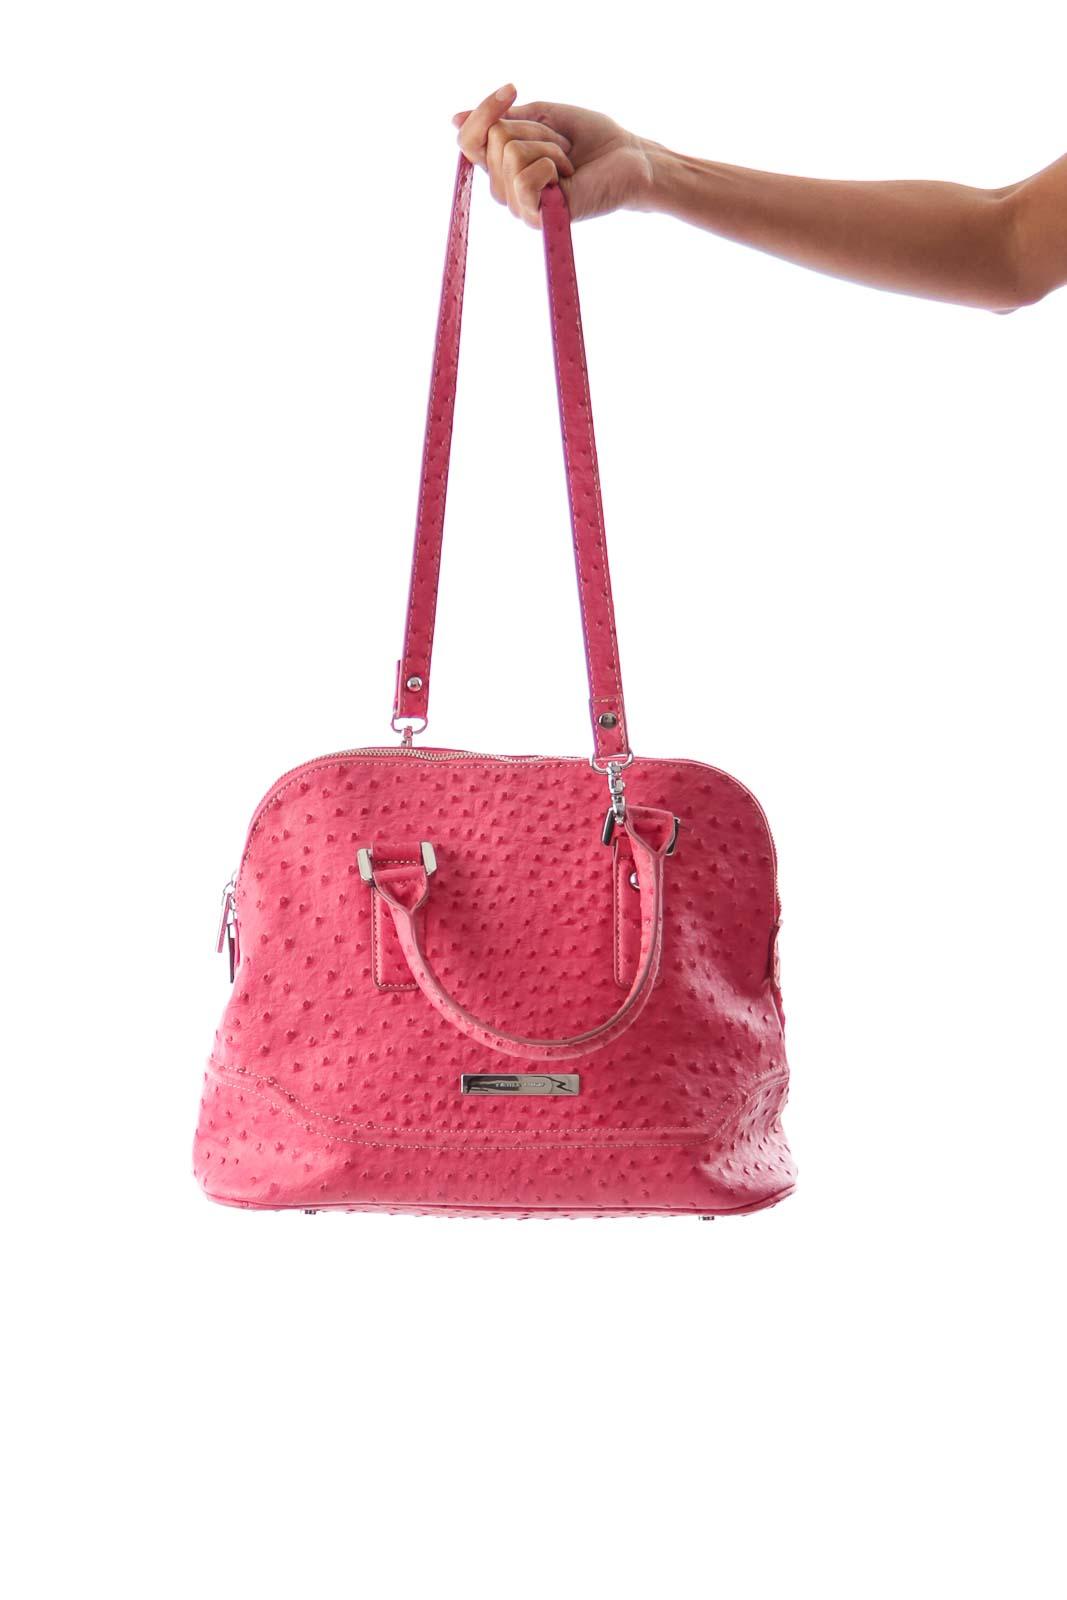 Pink Ostrich Satchel Bag Front